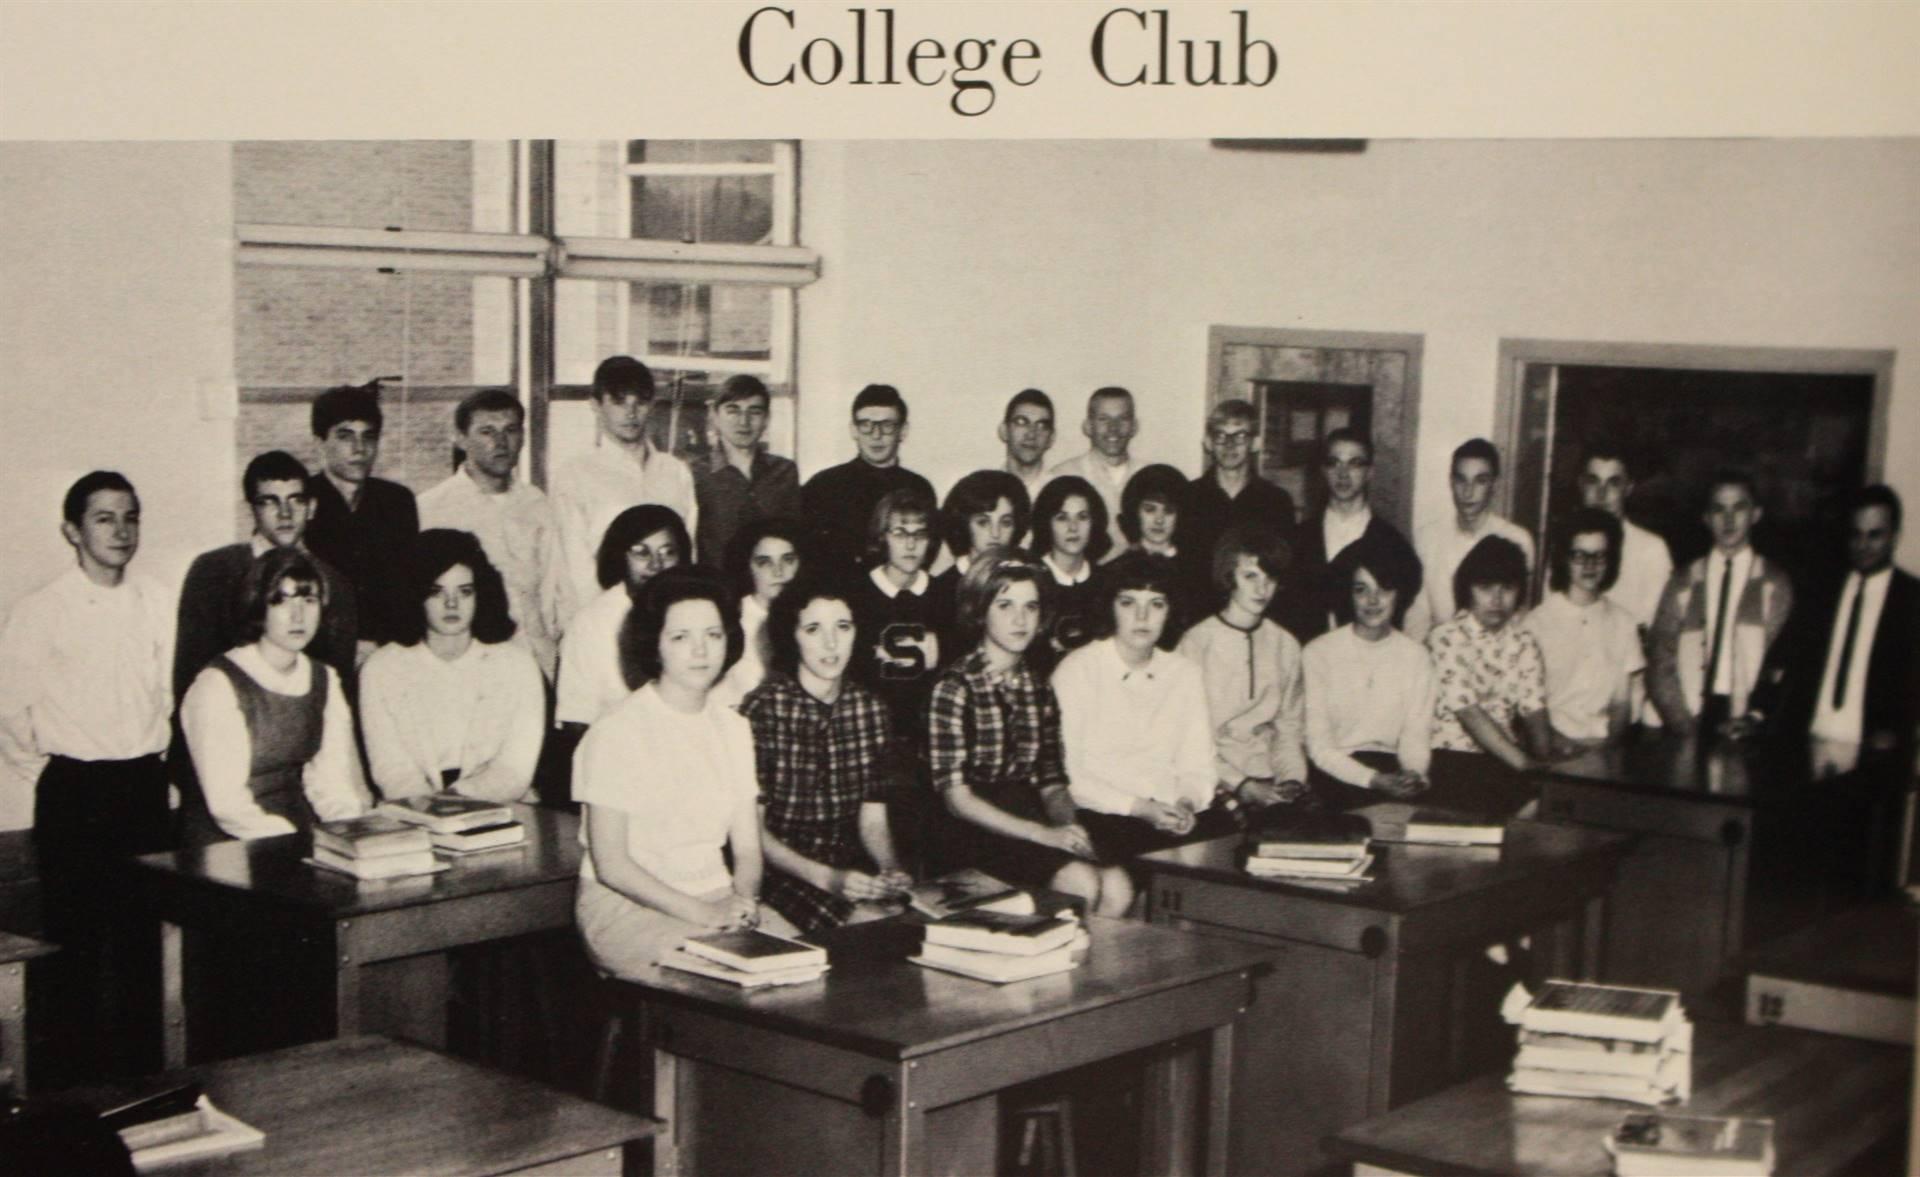 1966 College Club